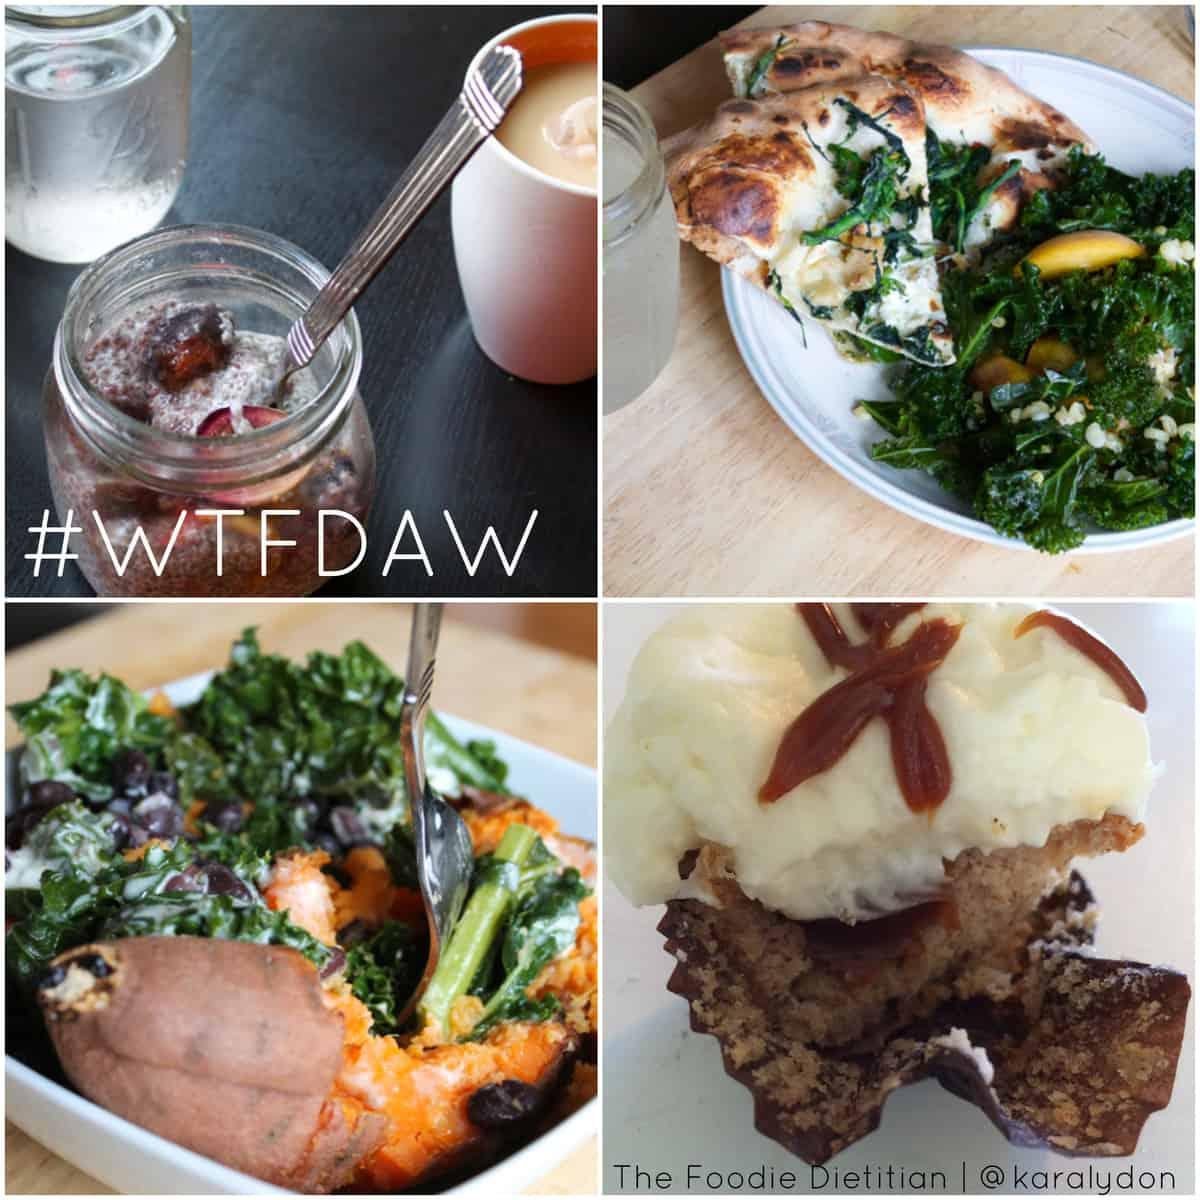 What The Foodie Dietitian Ate Wednesday #WTFDAW | The Foodie Dietitian @karalydon